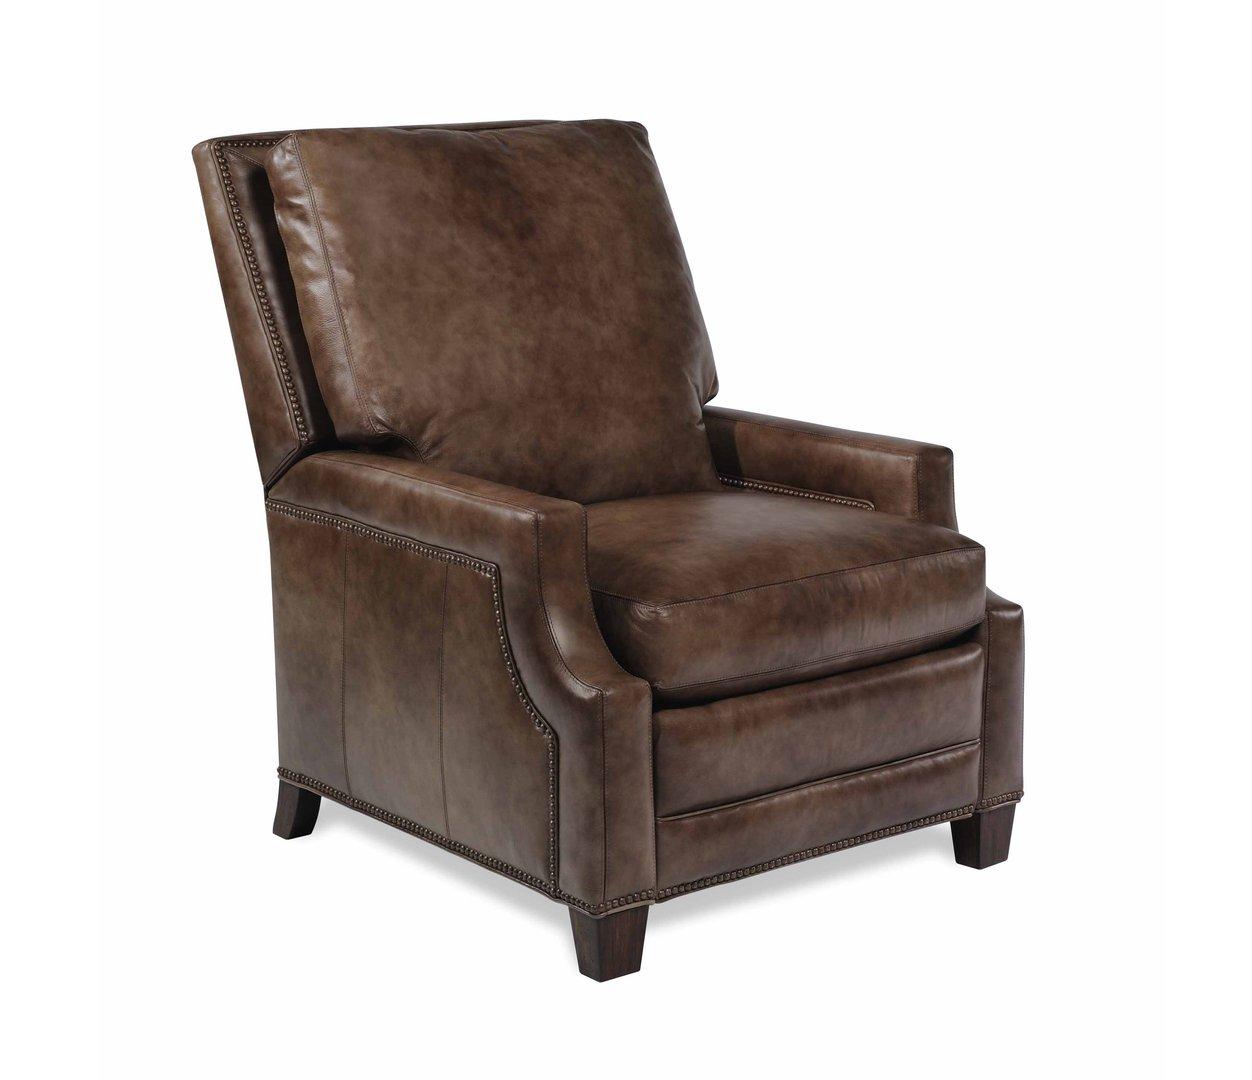 Kraft Reclining Chair Image